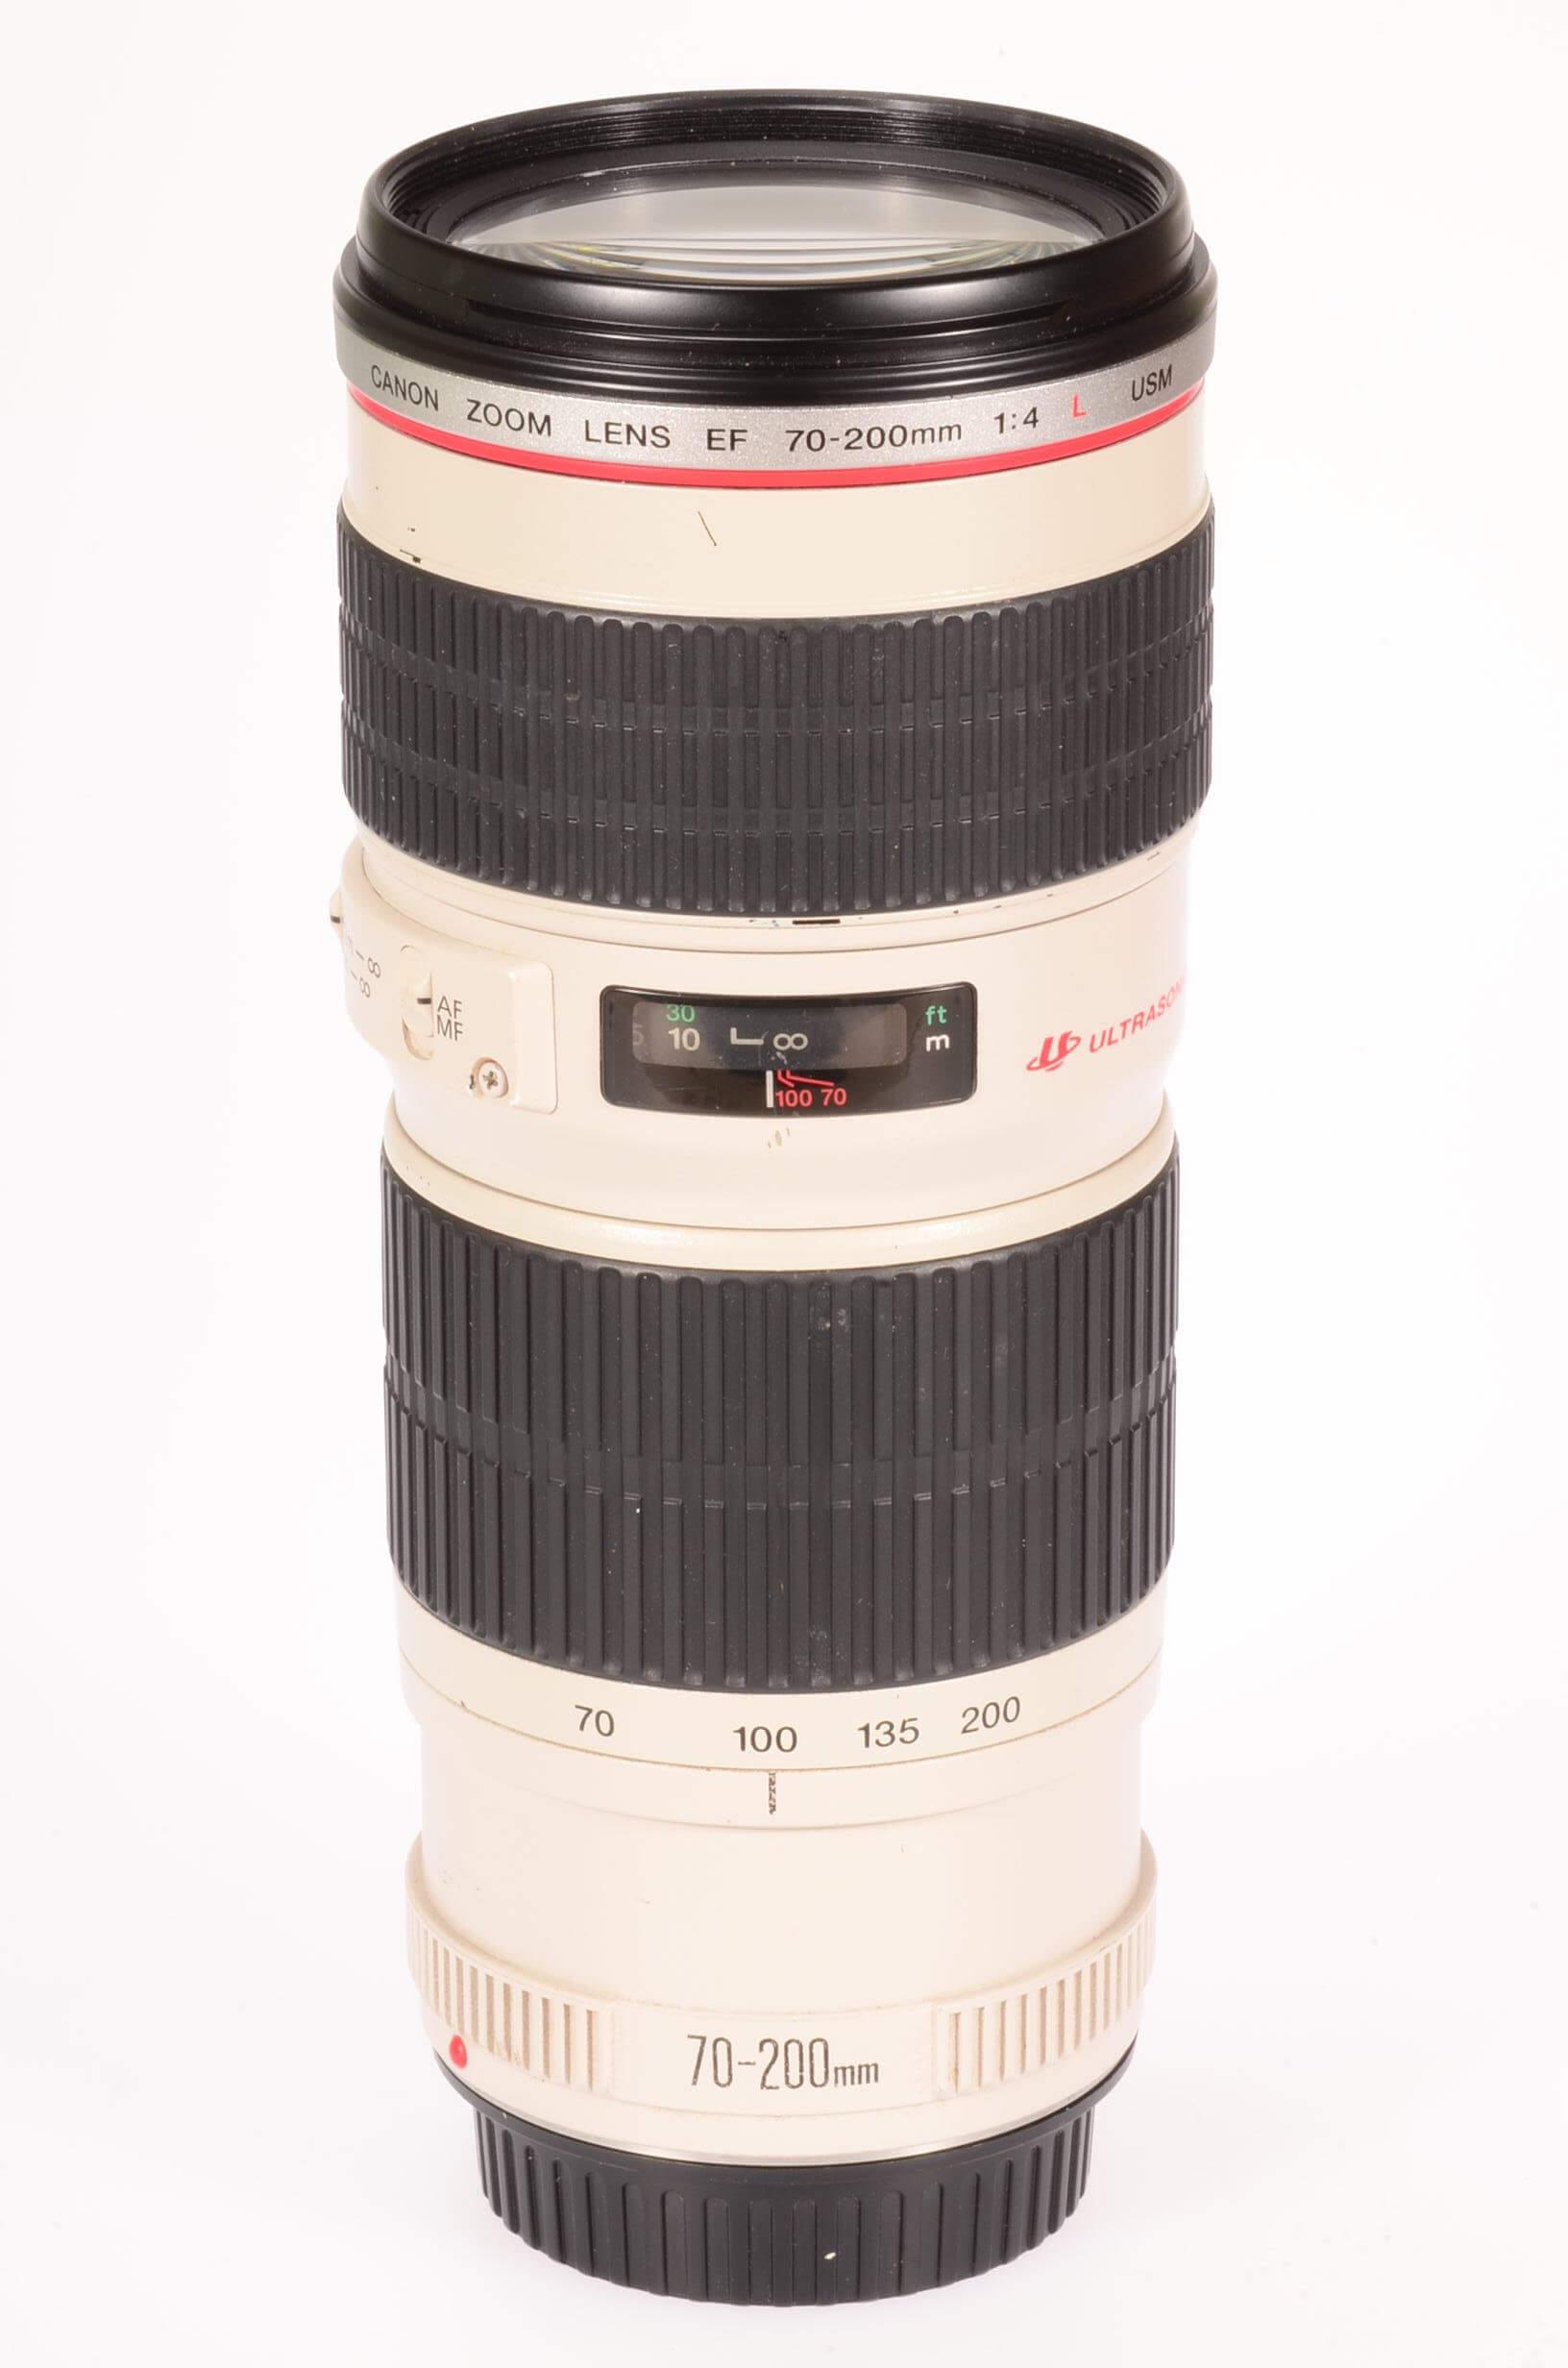 Canon 70-200mm f4 USM L lens